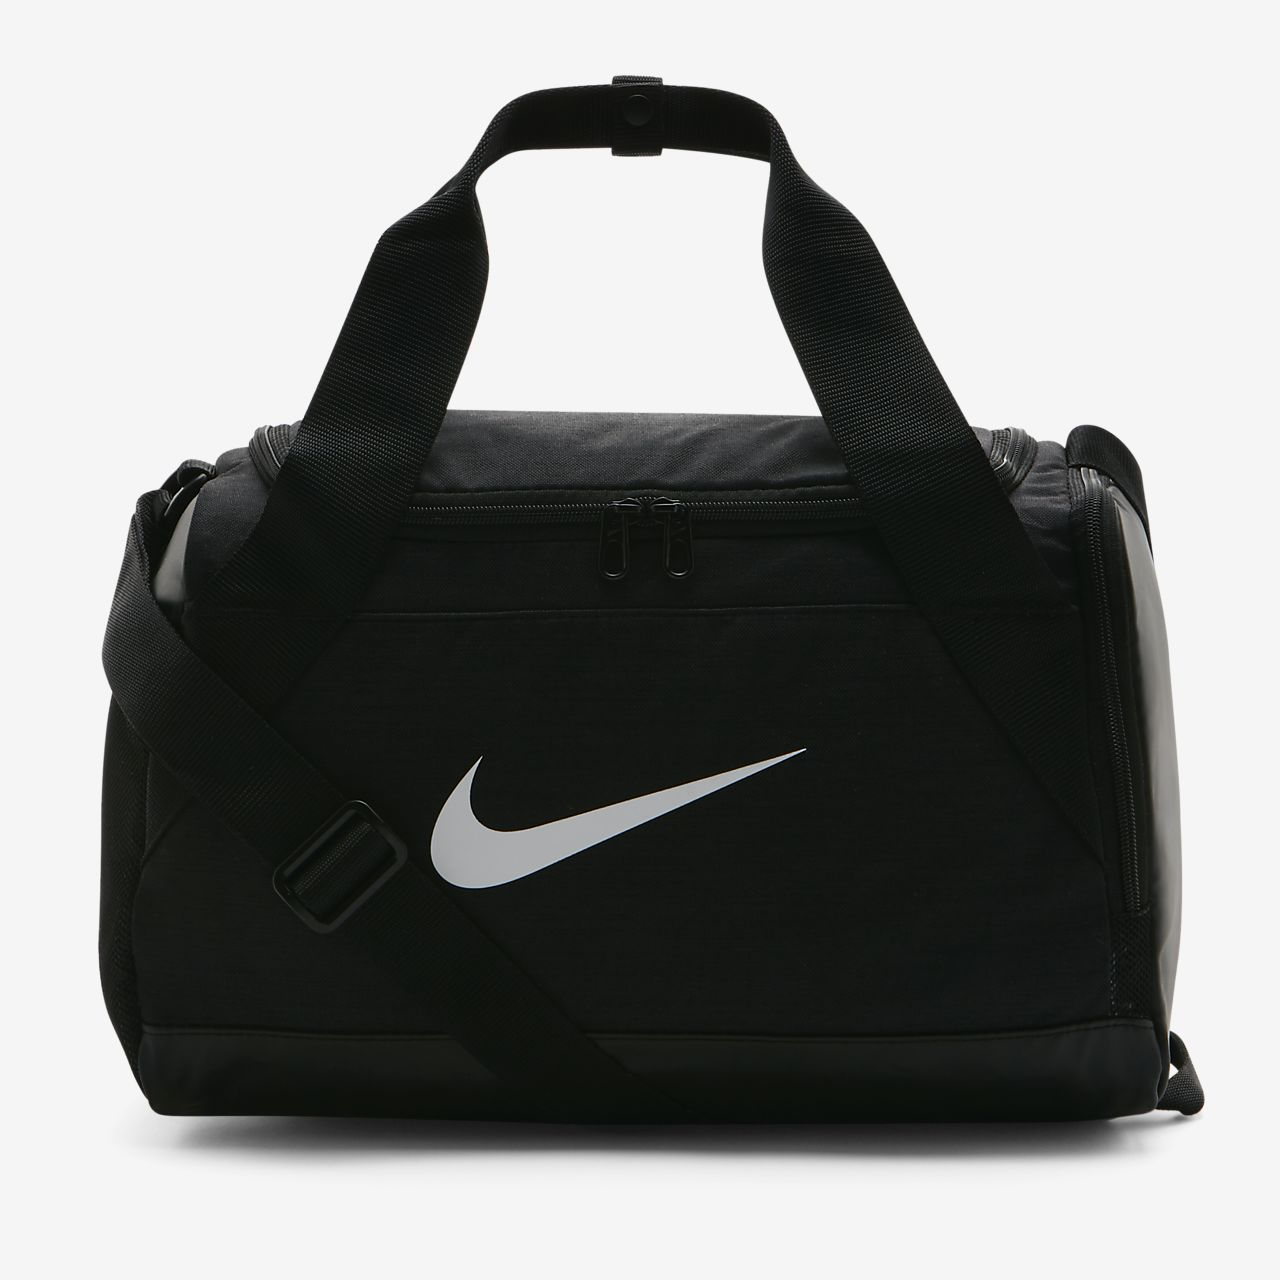 Träningsväska Nike Brasilia (extra small)